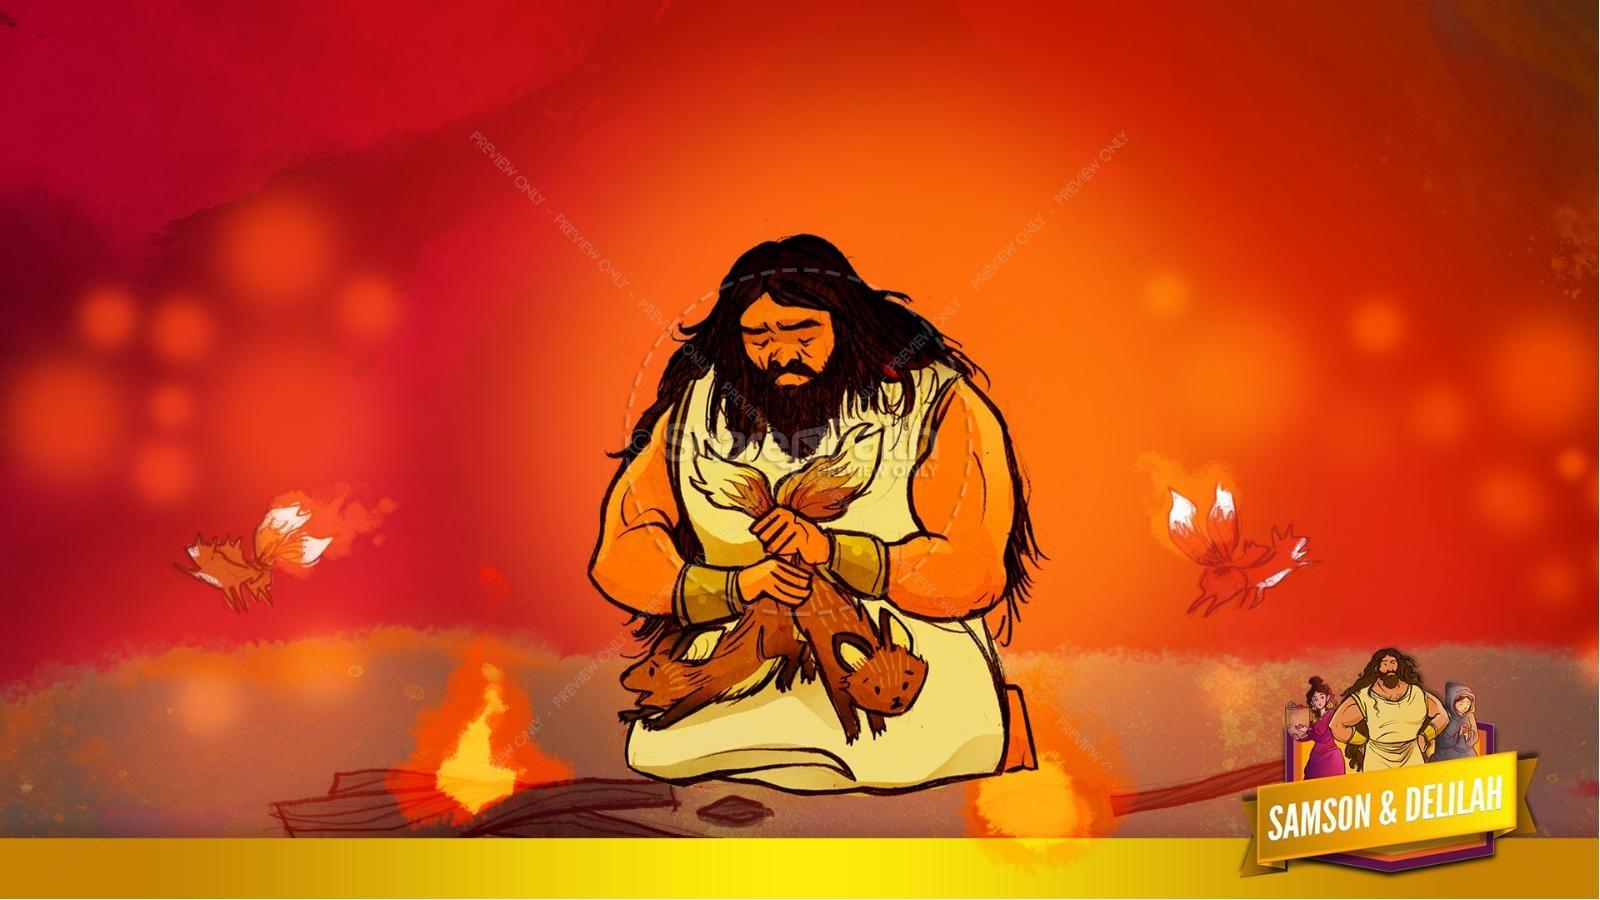 Samson and Delilah Kids Bible Stories | slide 39